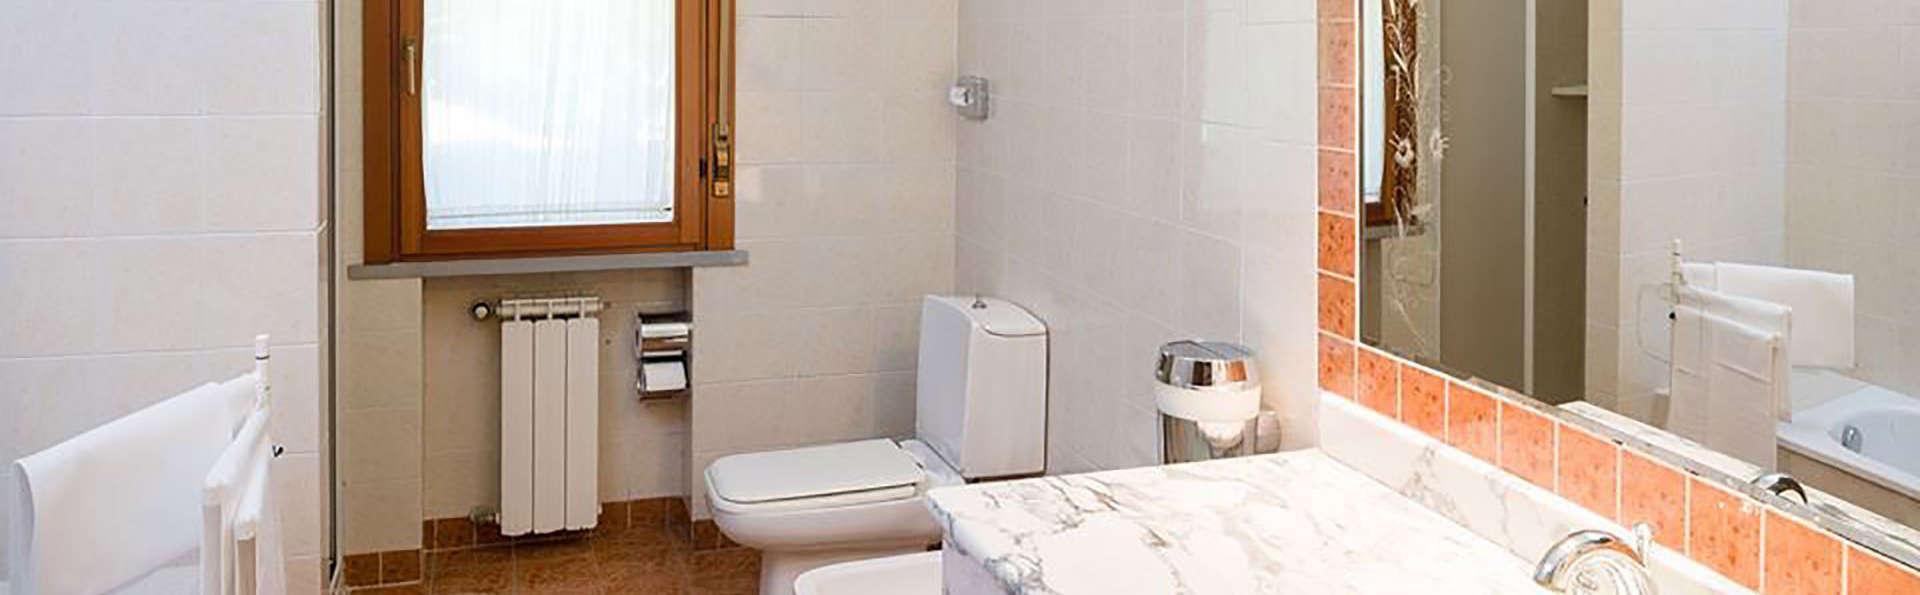 Hotel Ristorante Milano - EDIT_bath.jpg